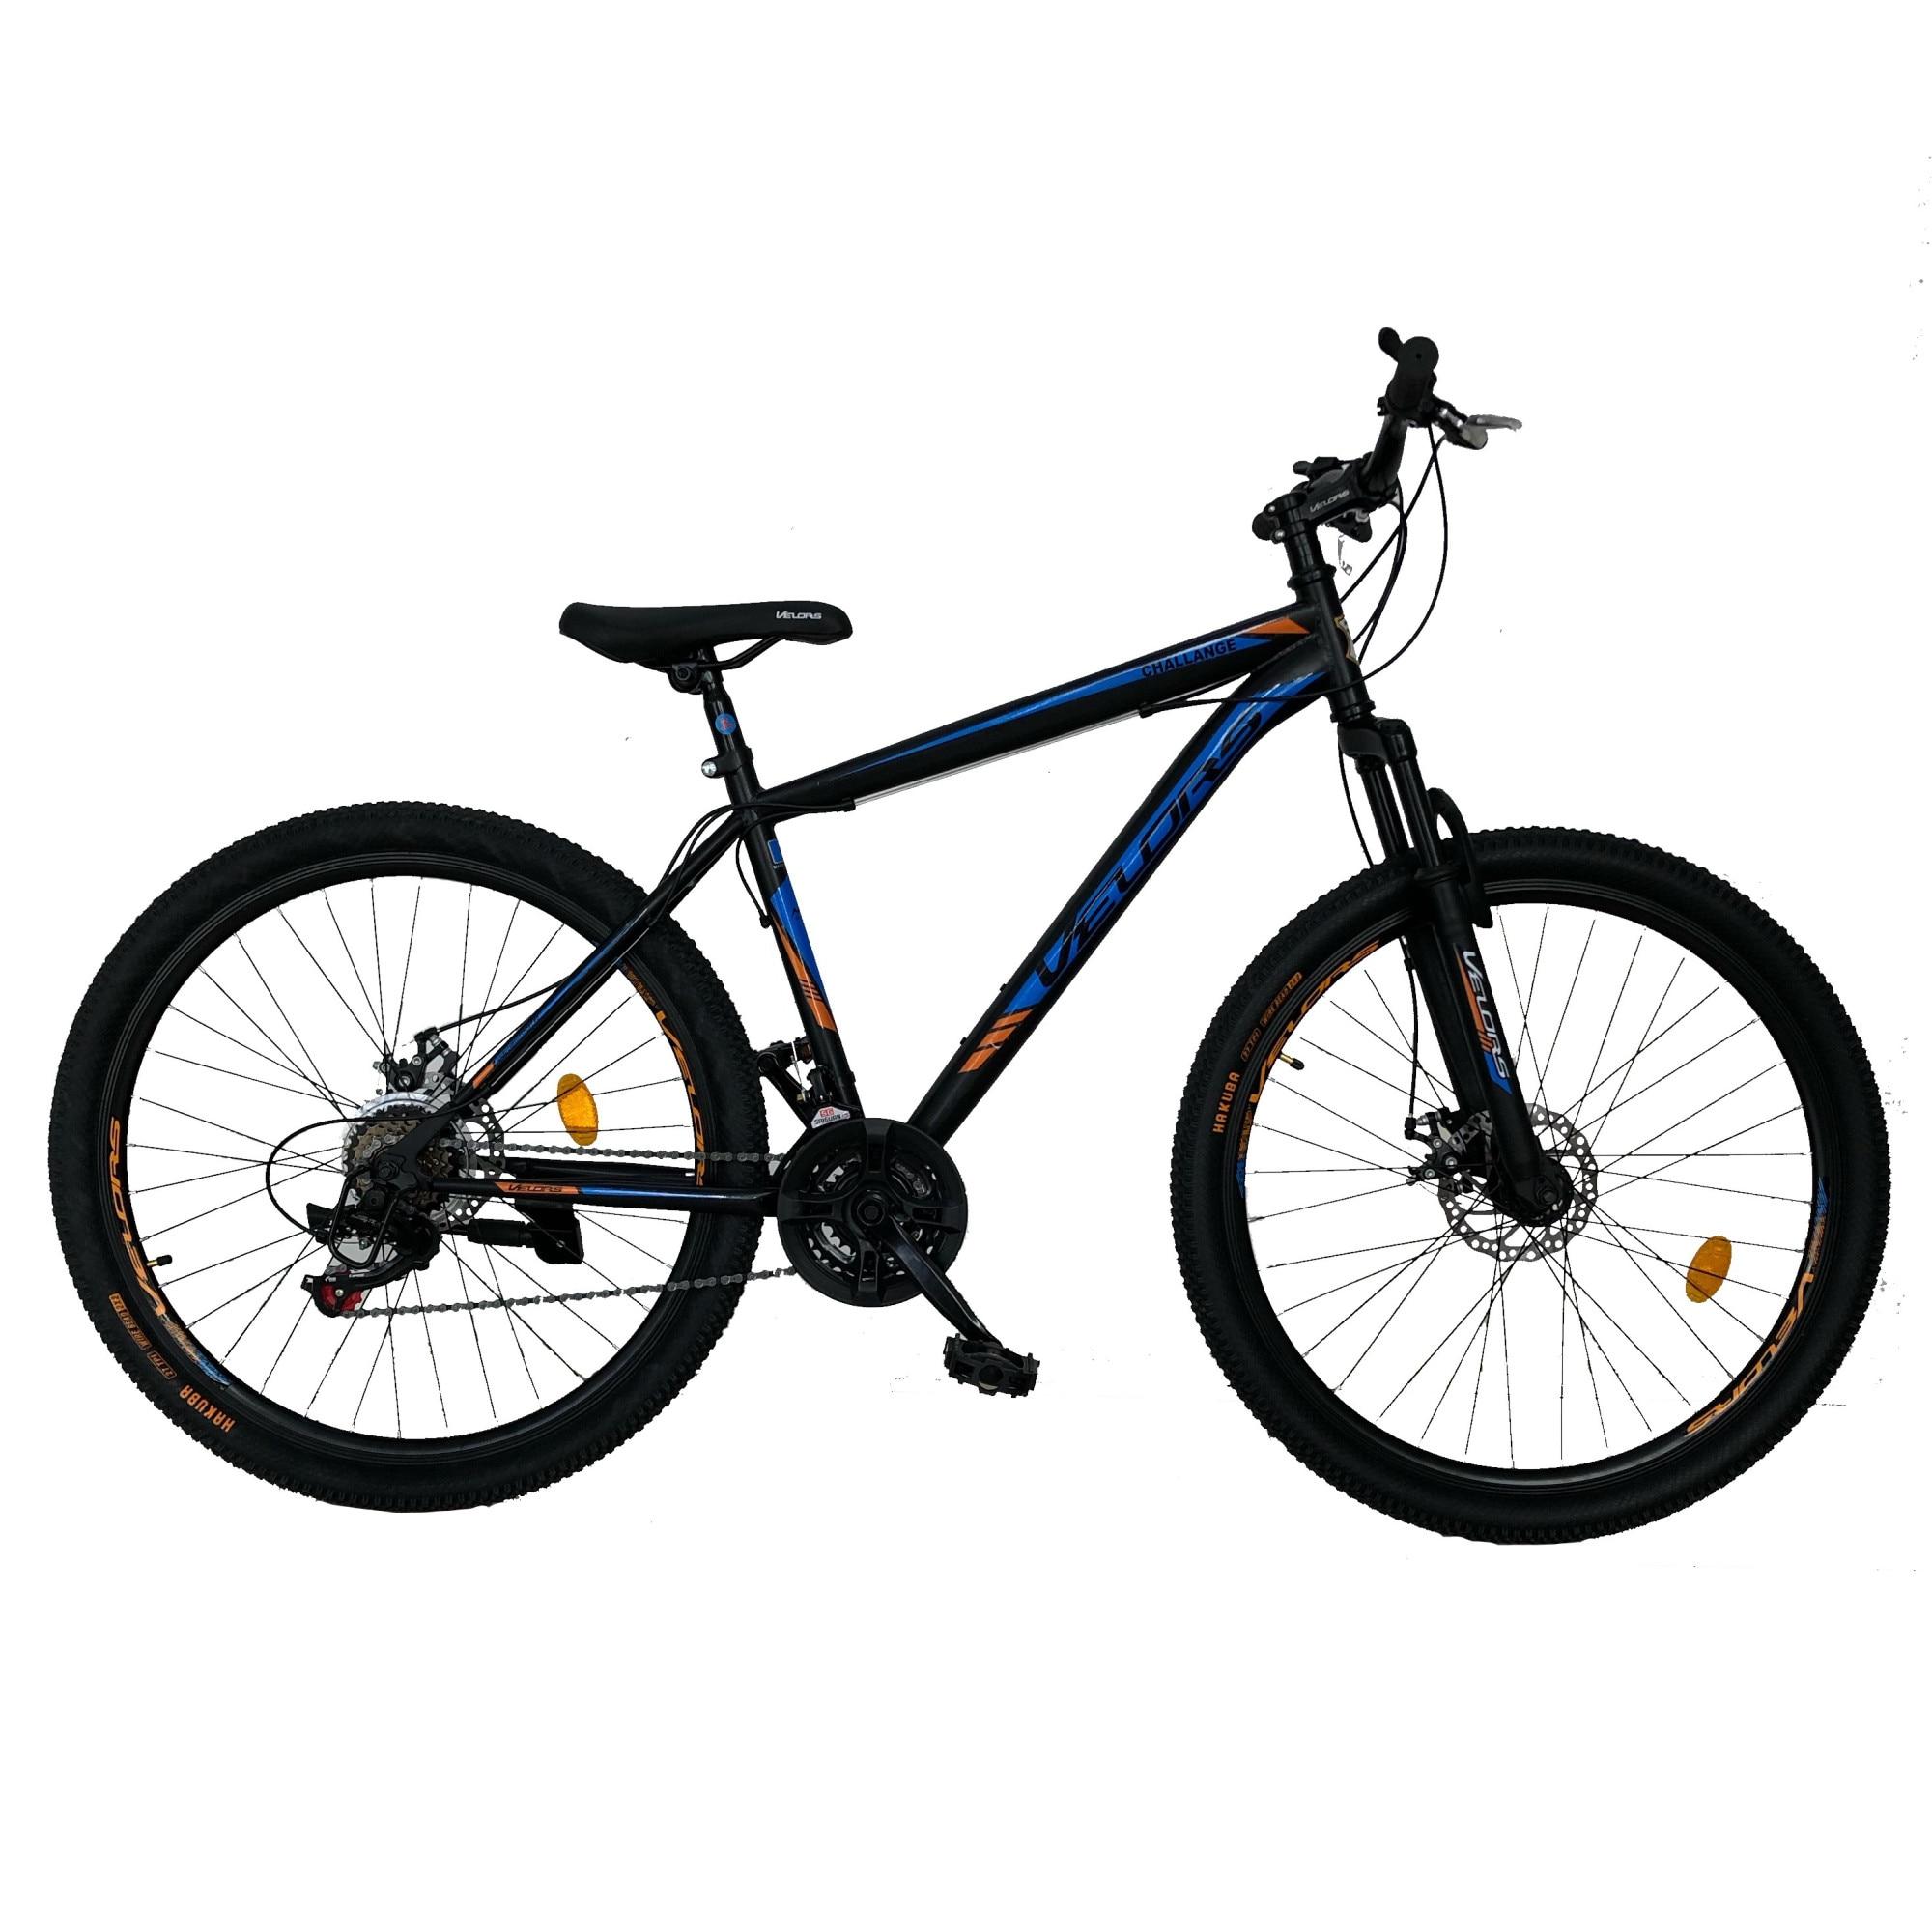 "Fotografie Bicicleta MTB Velors 27.5"" V2710A HT, Negru/Albastru/Portocaliu"